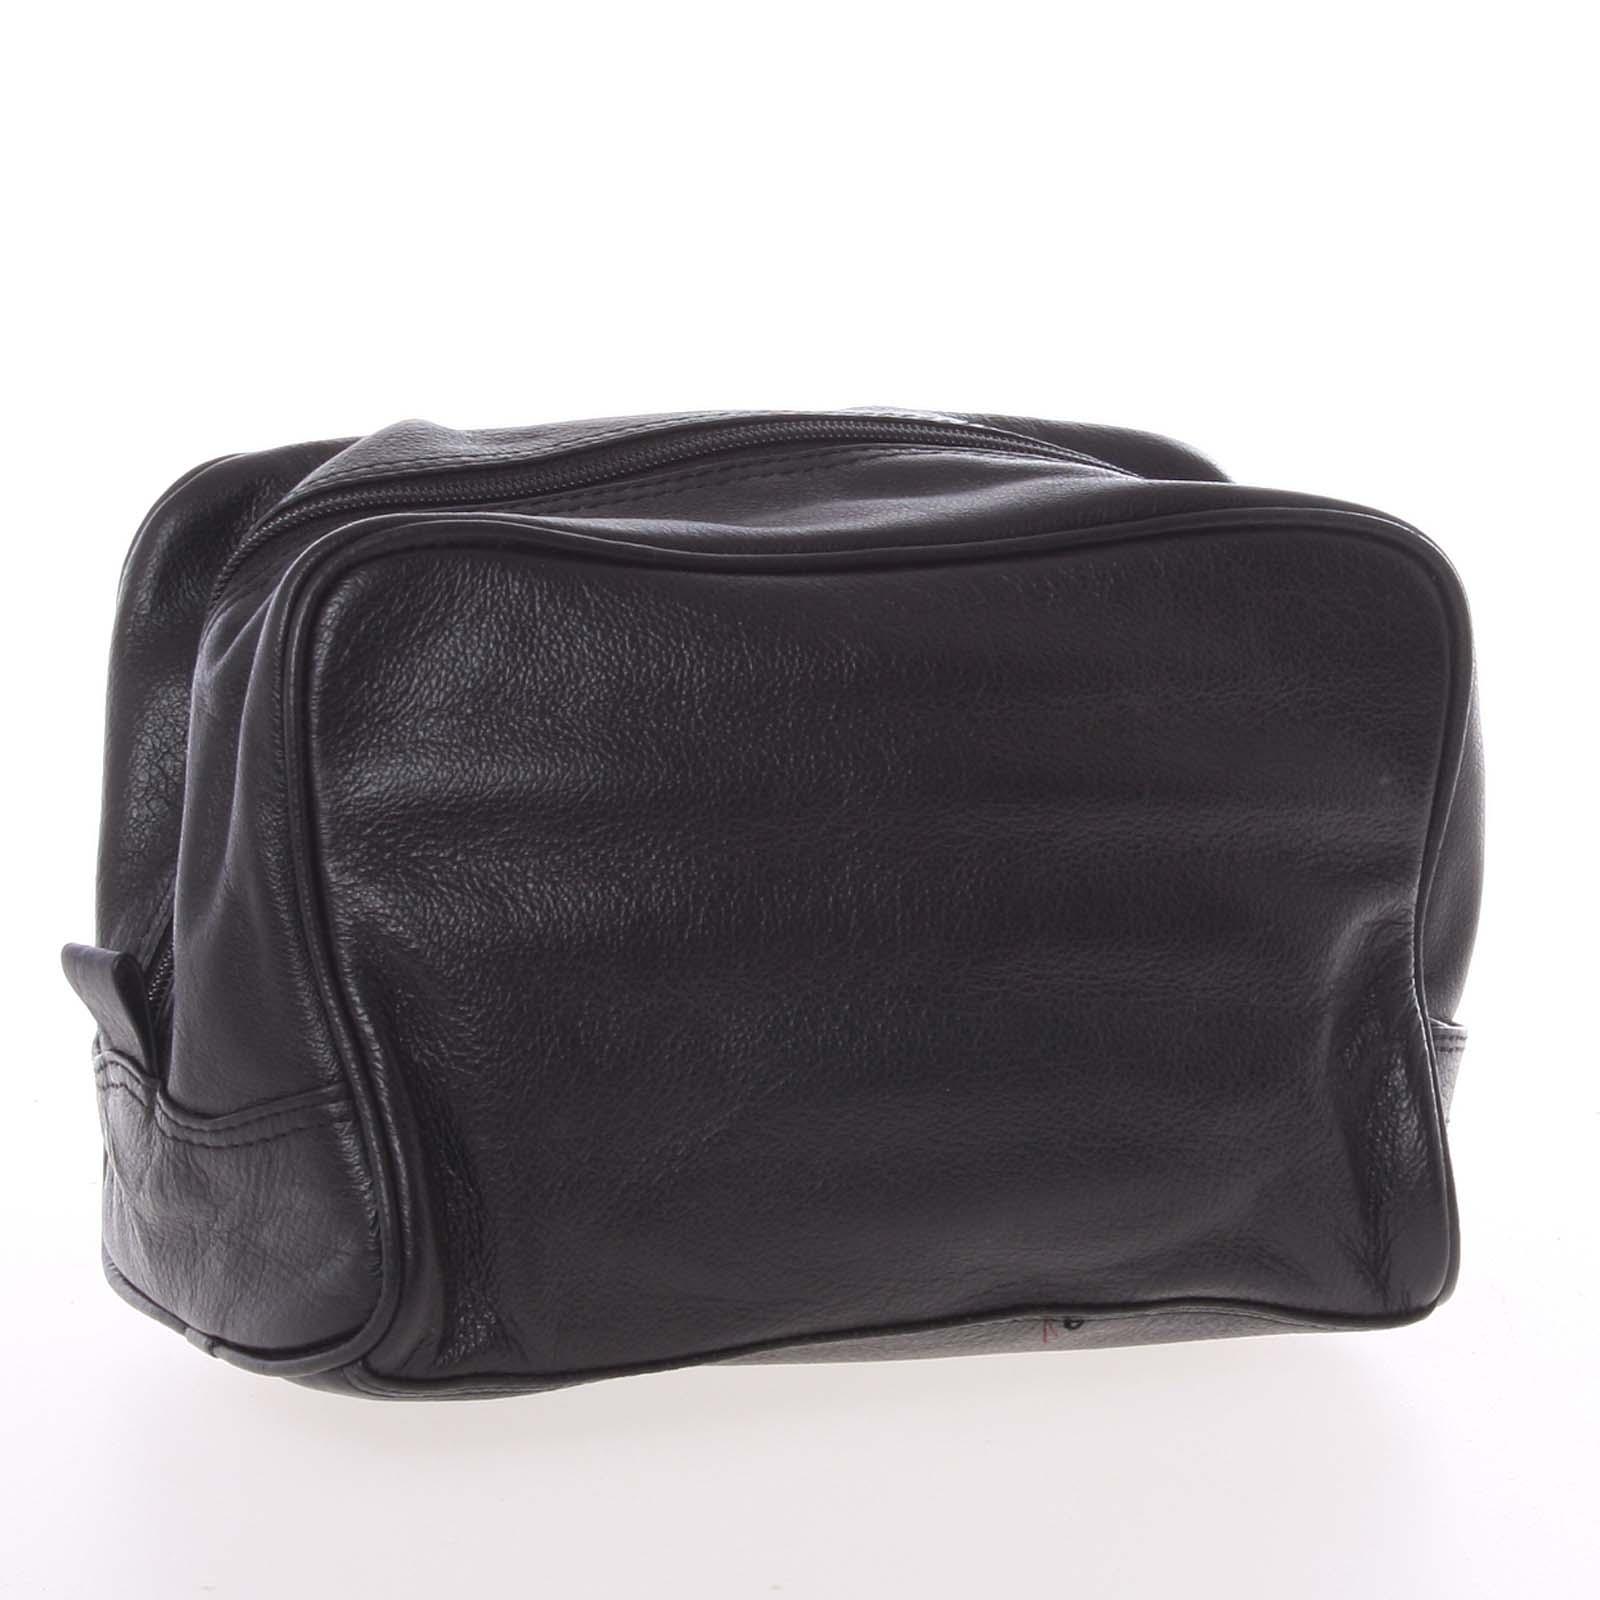 Pánská černá kožená kosmetická taška - E680